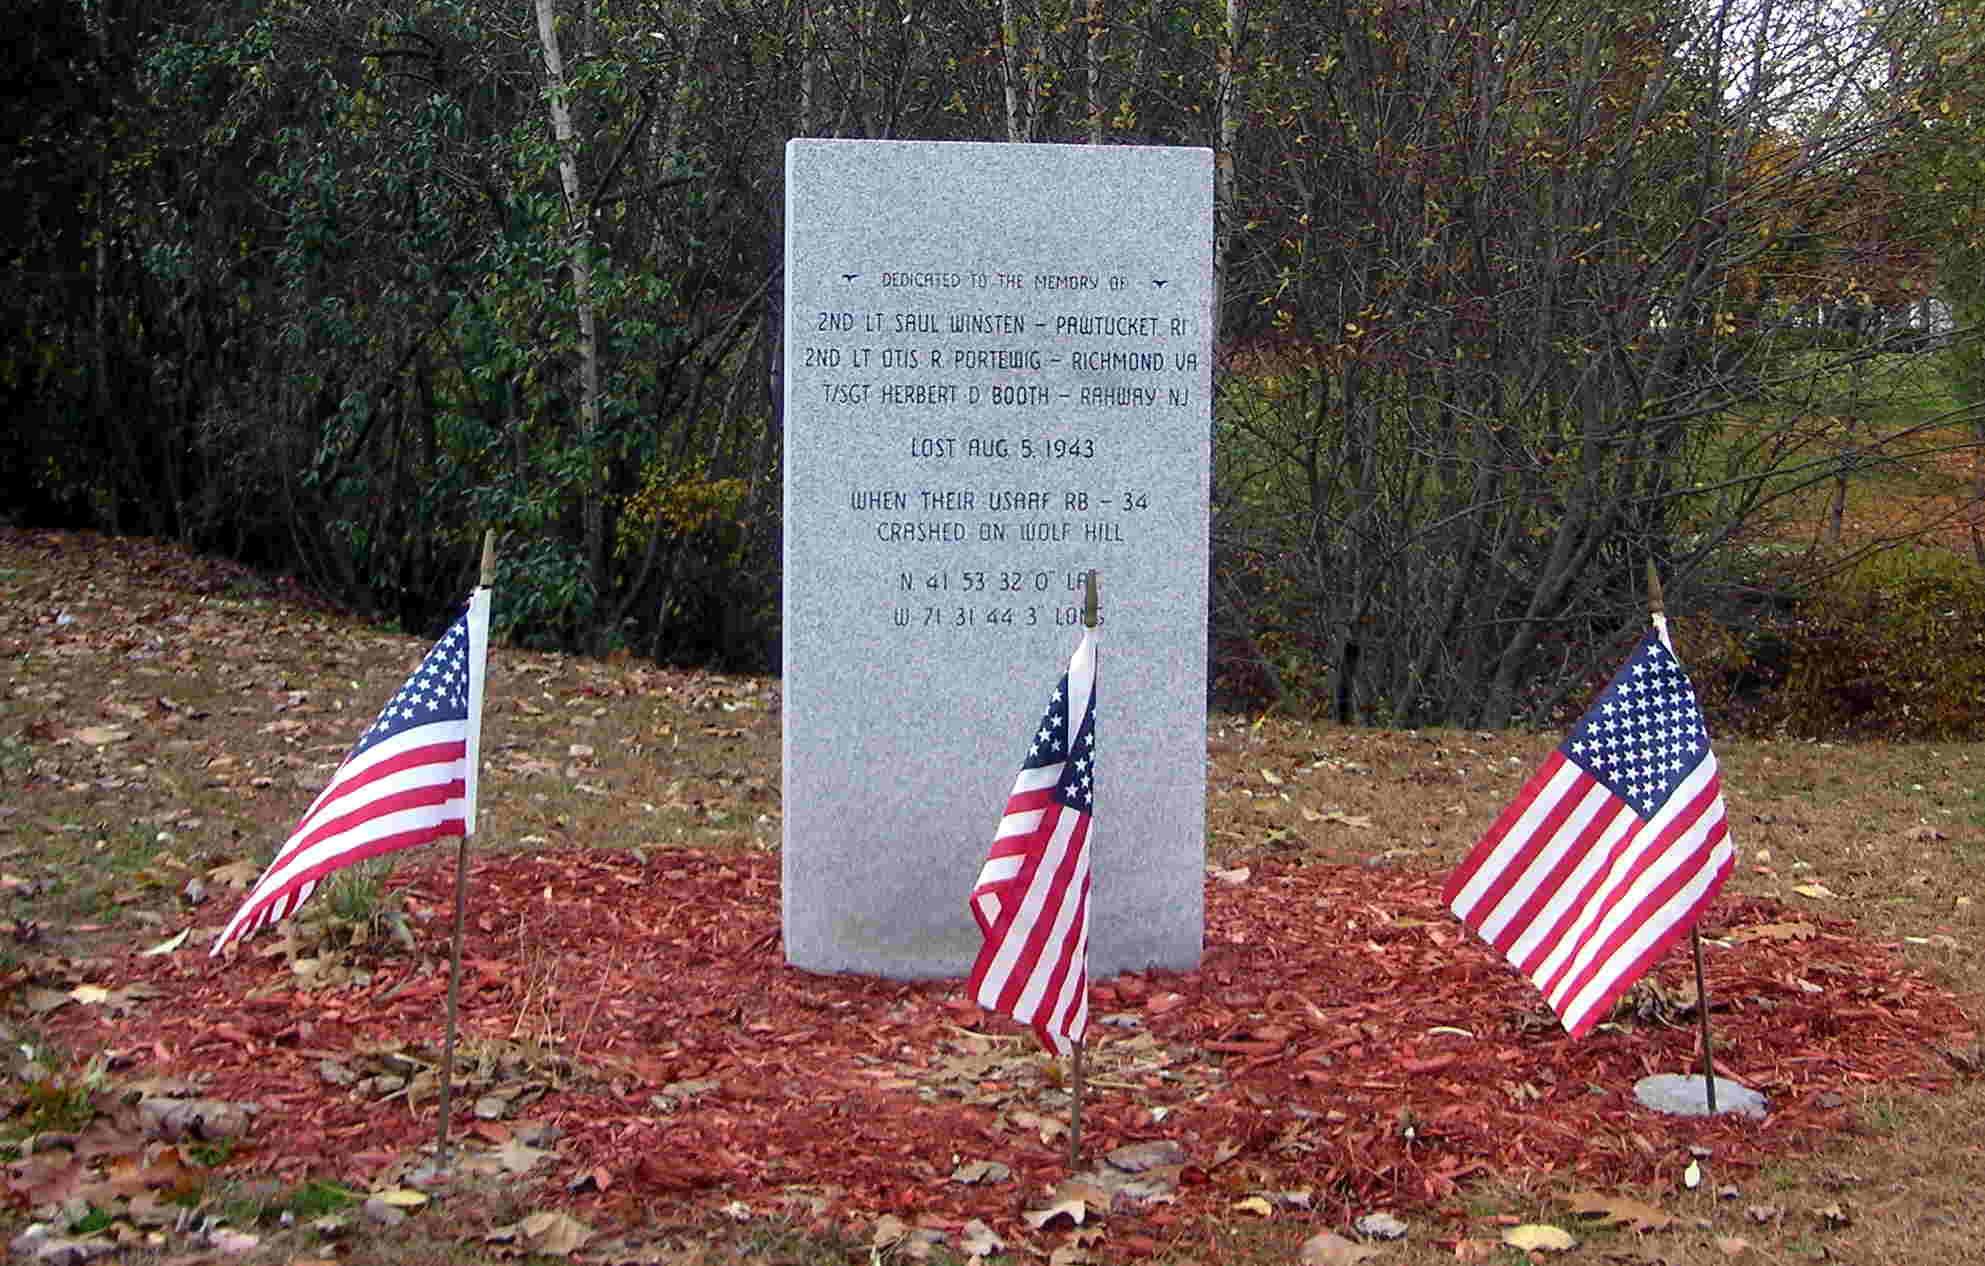 Rhode Island Plane Crash | | New England Aviation History